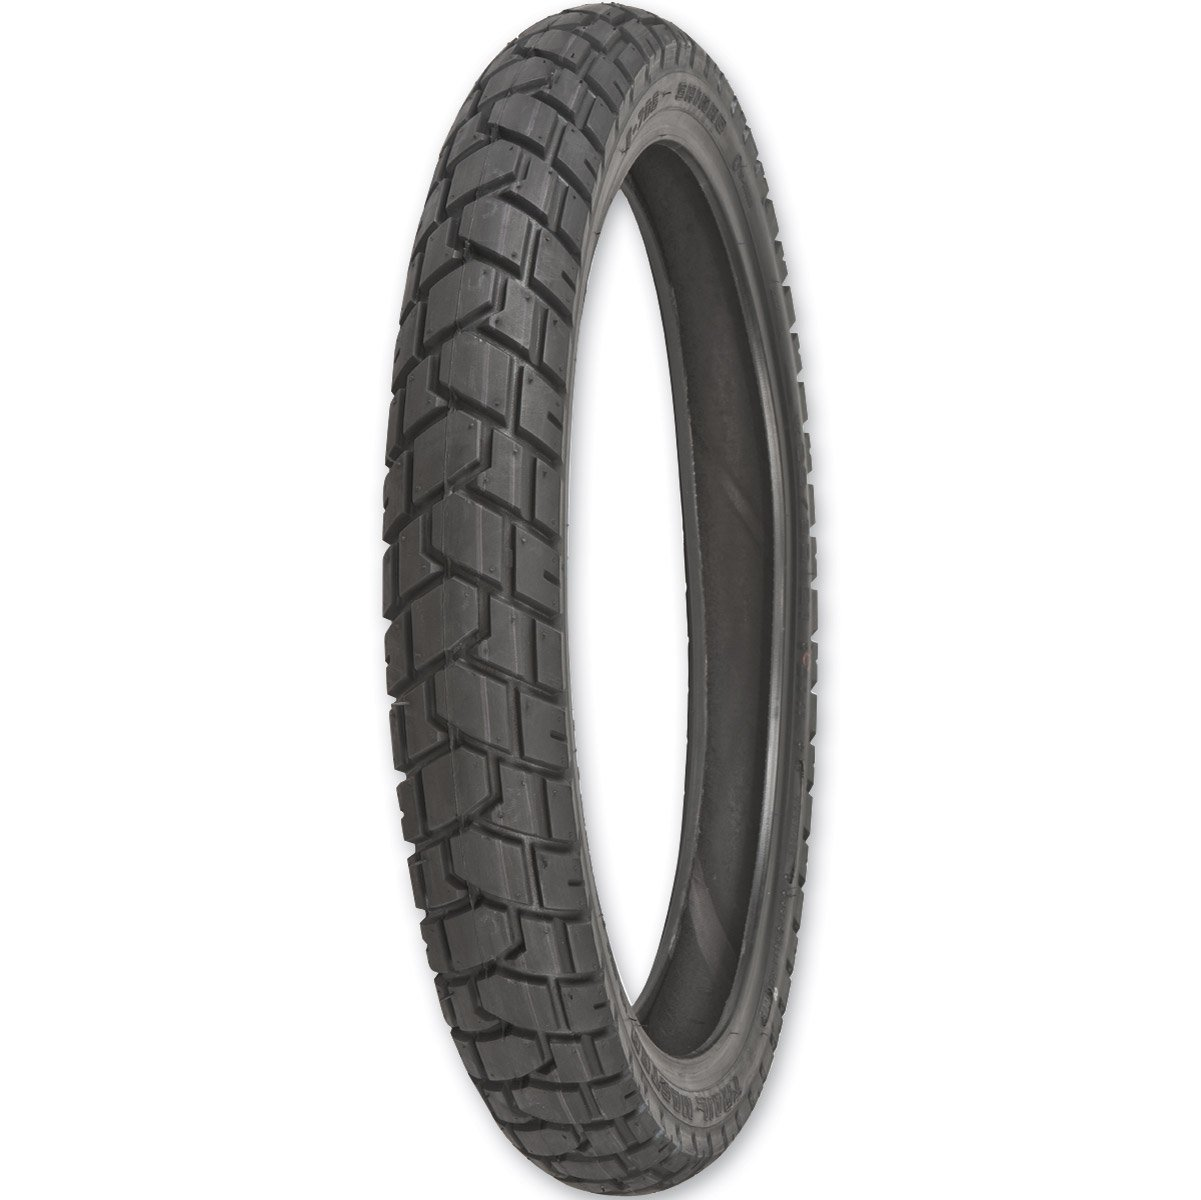 Shinko Dual Sport 705 Series Rear Tire (150/70-17TL) 4333046825